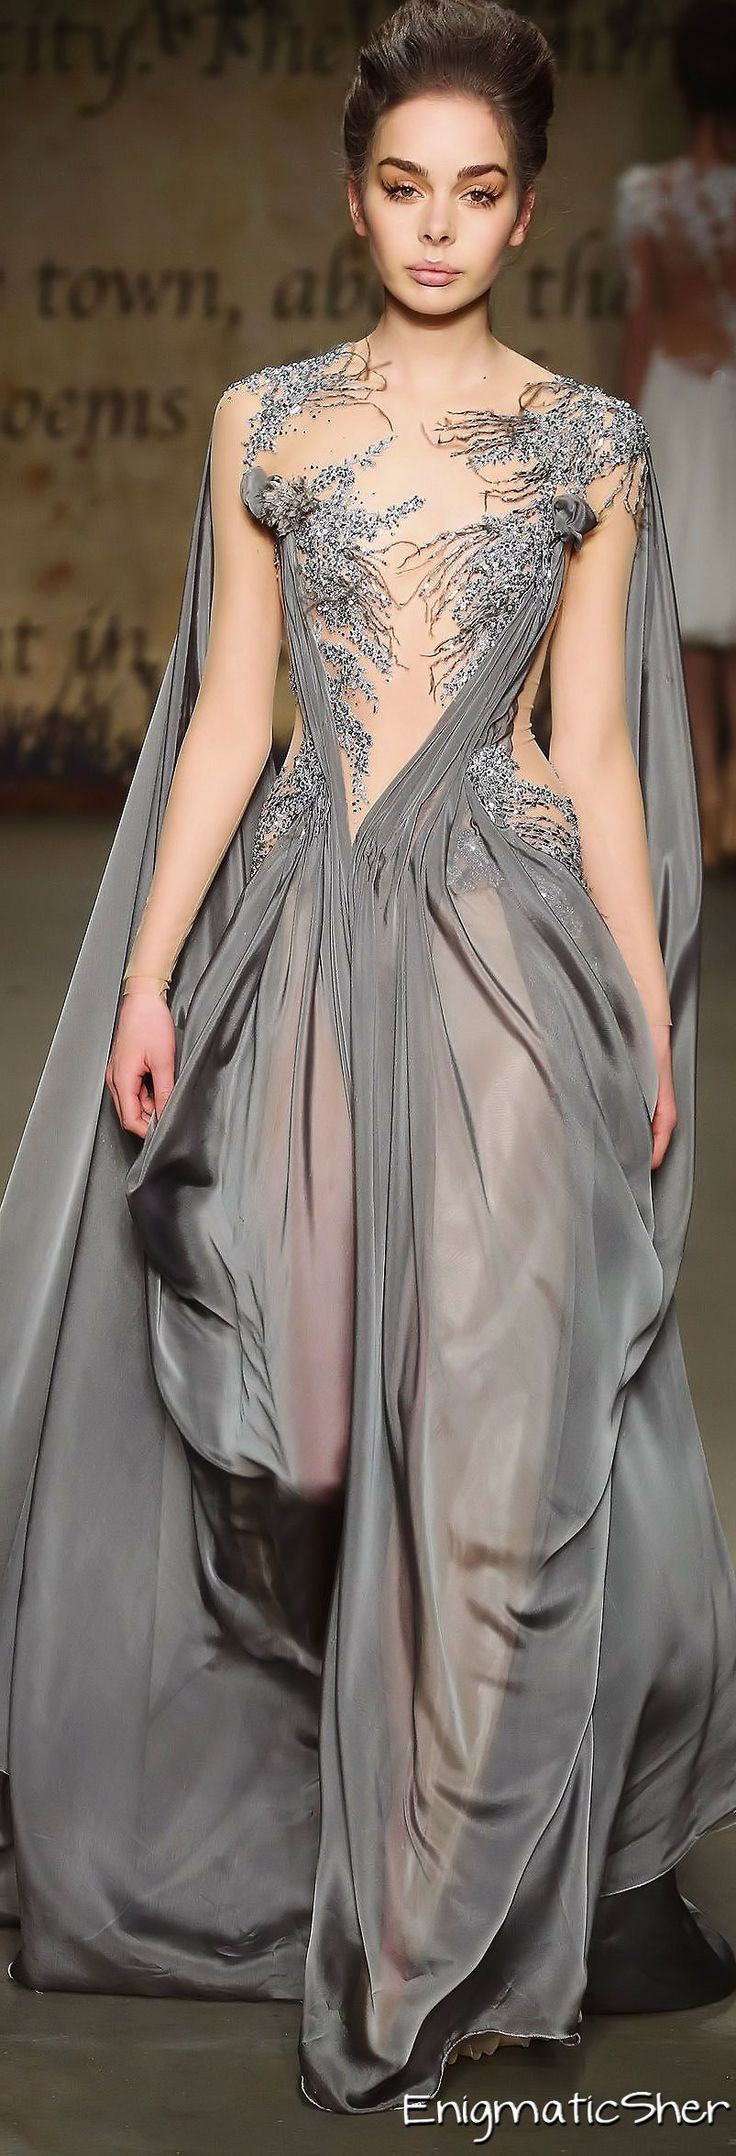 Edwin Oudshoorn ~ Sheer Evening Gown, Silver-Grey